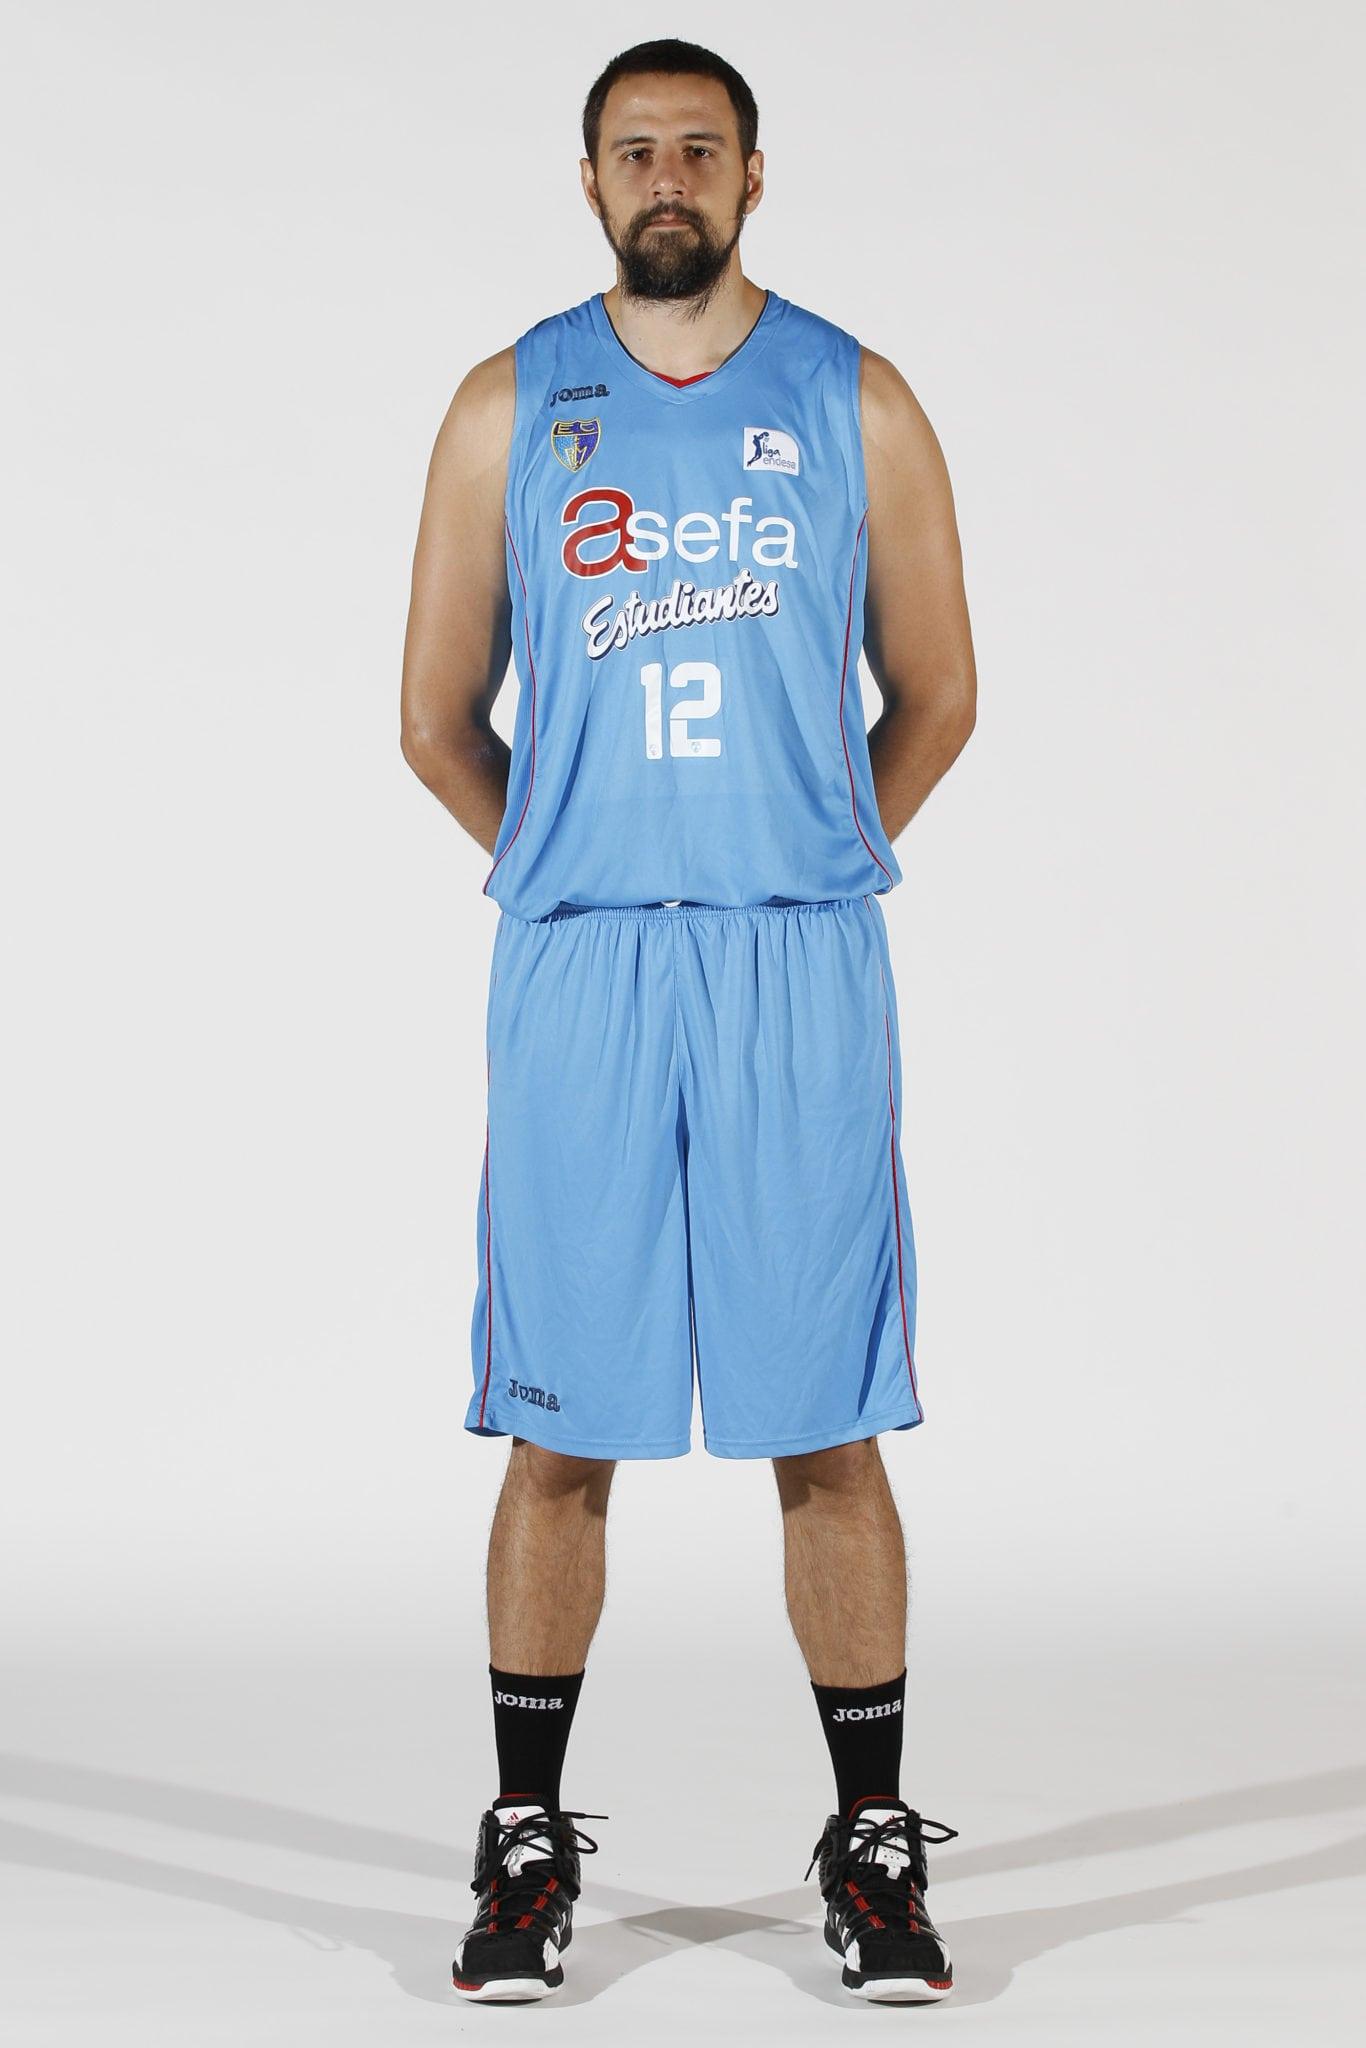 Germán Gabriel, MVP de diciembre